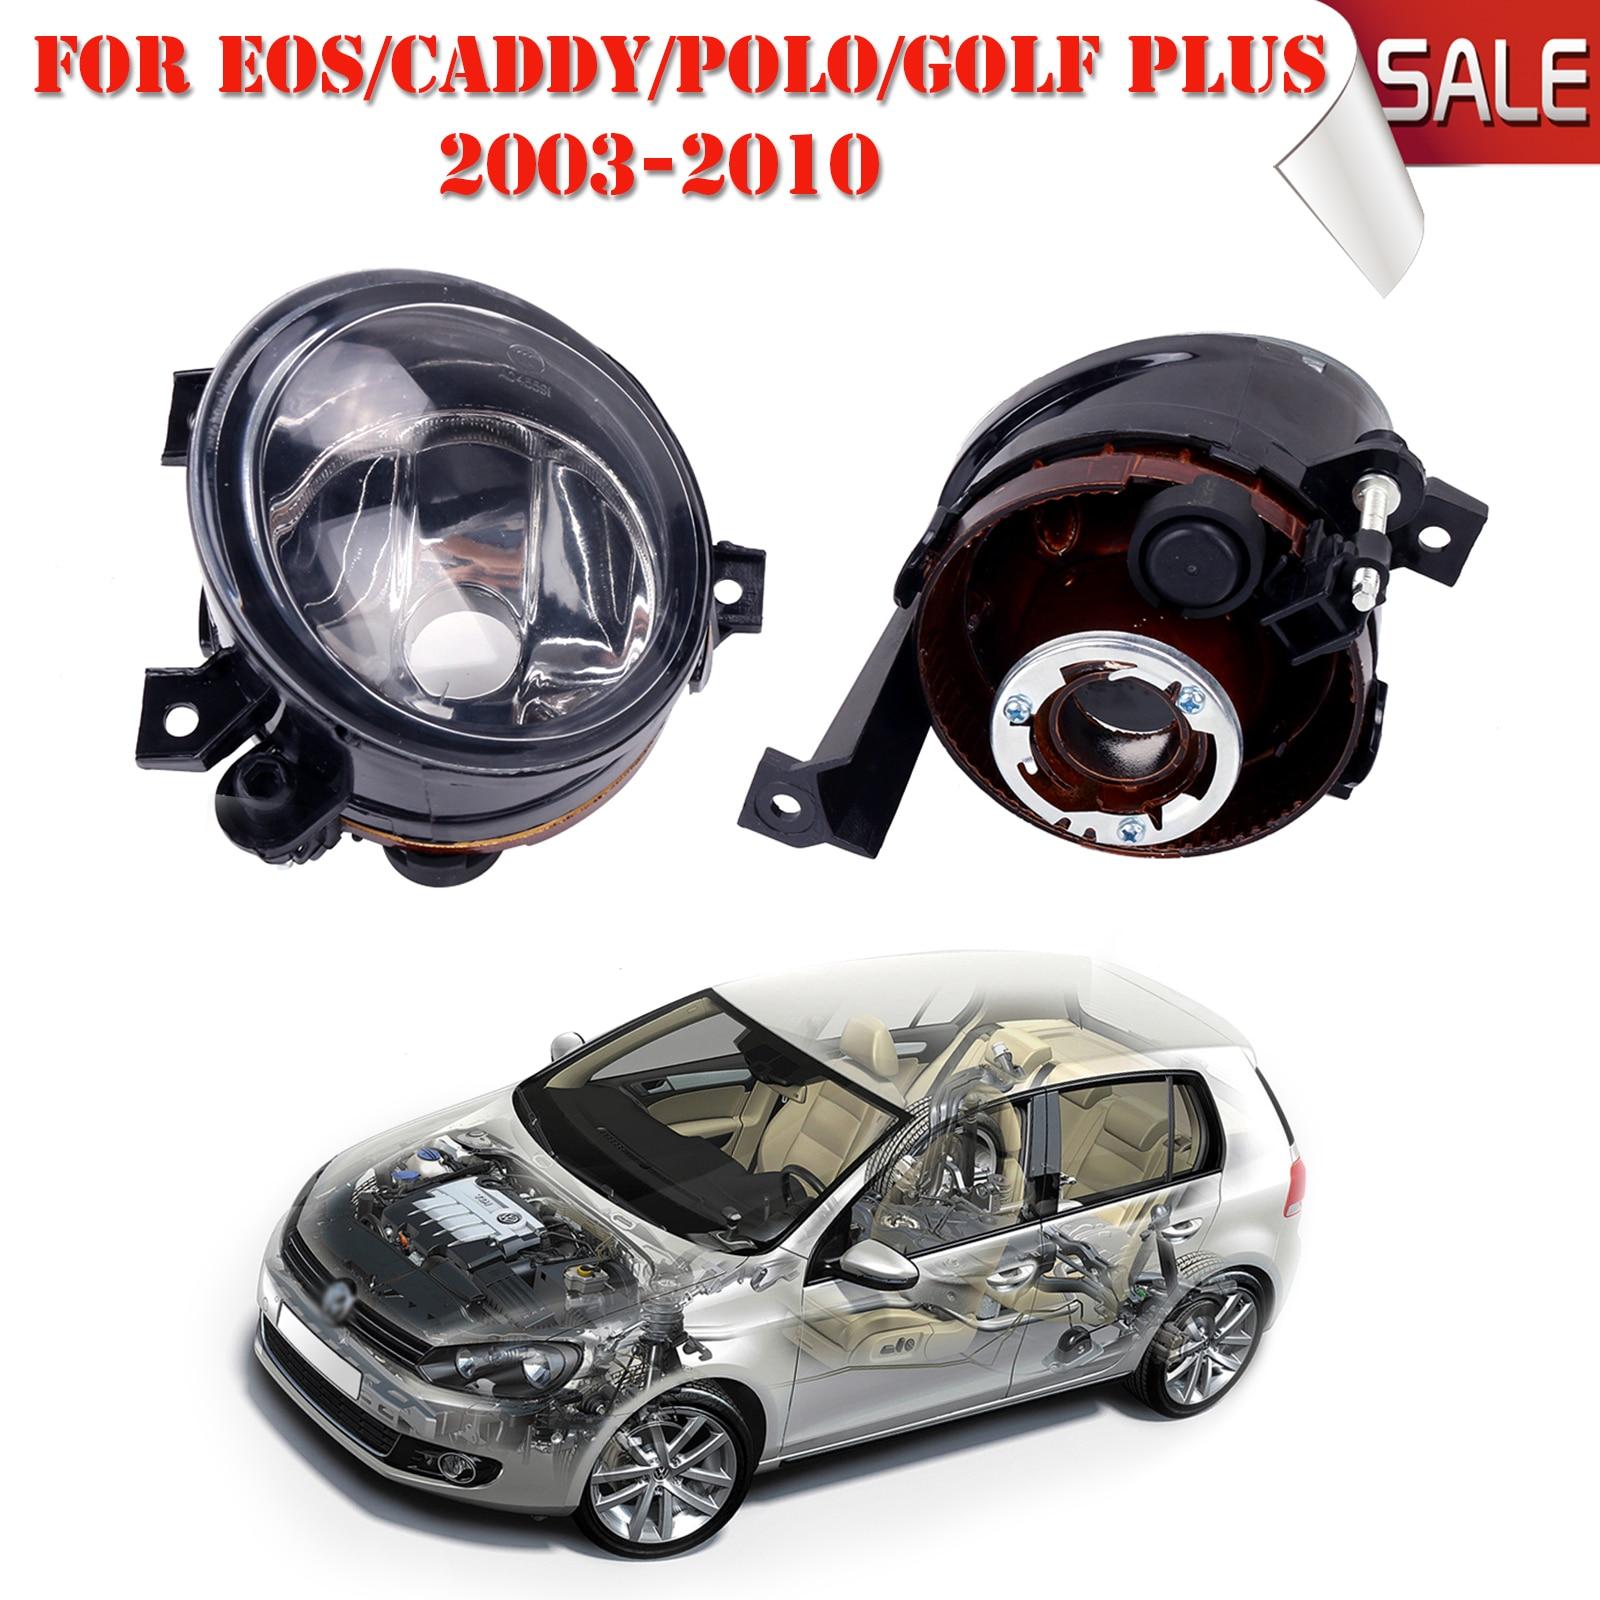 ФОТО 2x Fog Lights Housing Foglamps Set For VW Caddy III Eos Golf Plus Polo Tiguan Touran Wagon Replacement Car Styling #P324